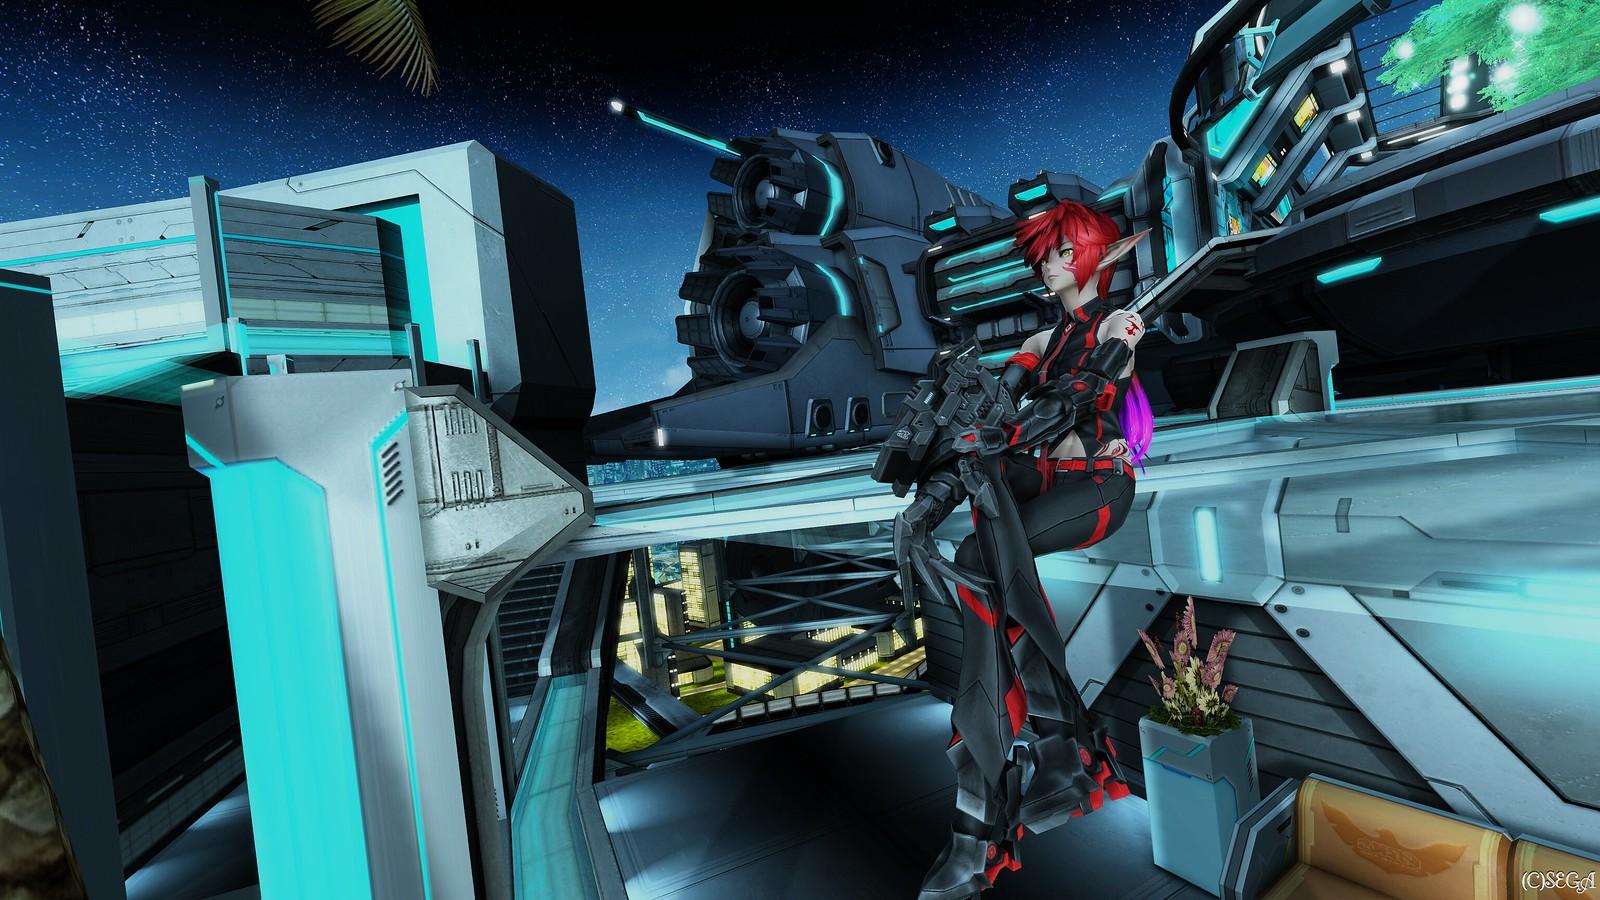 Phantasy Star Online 2 Screenshot 2020.12.06 - 01.49.18.22